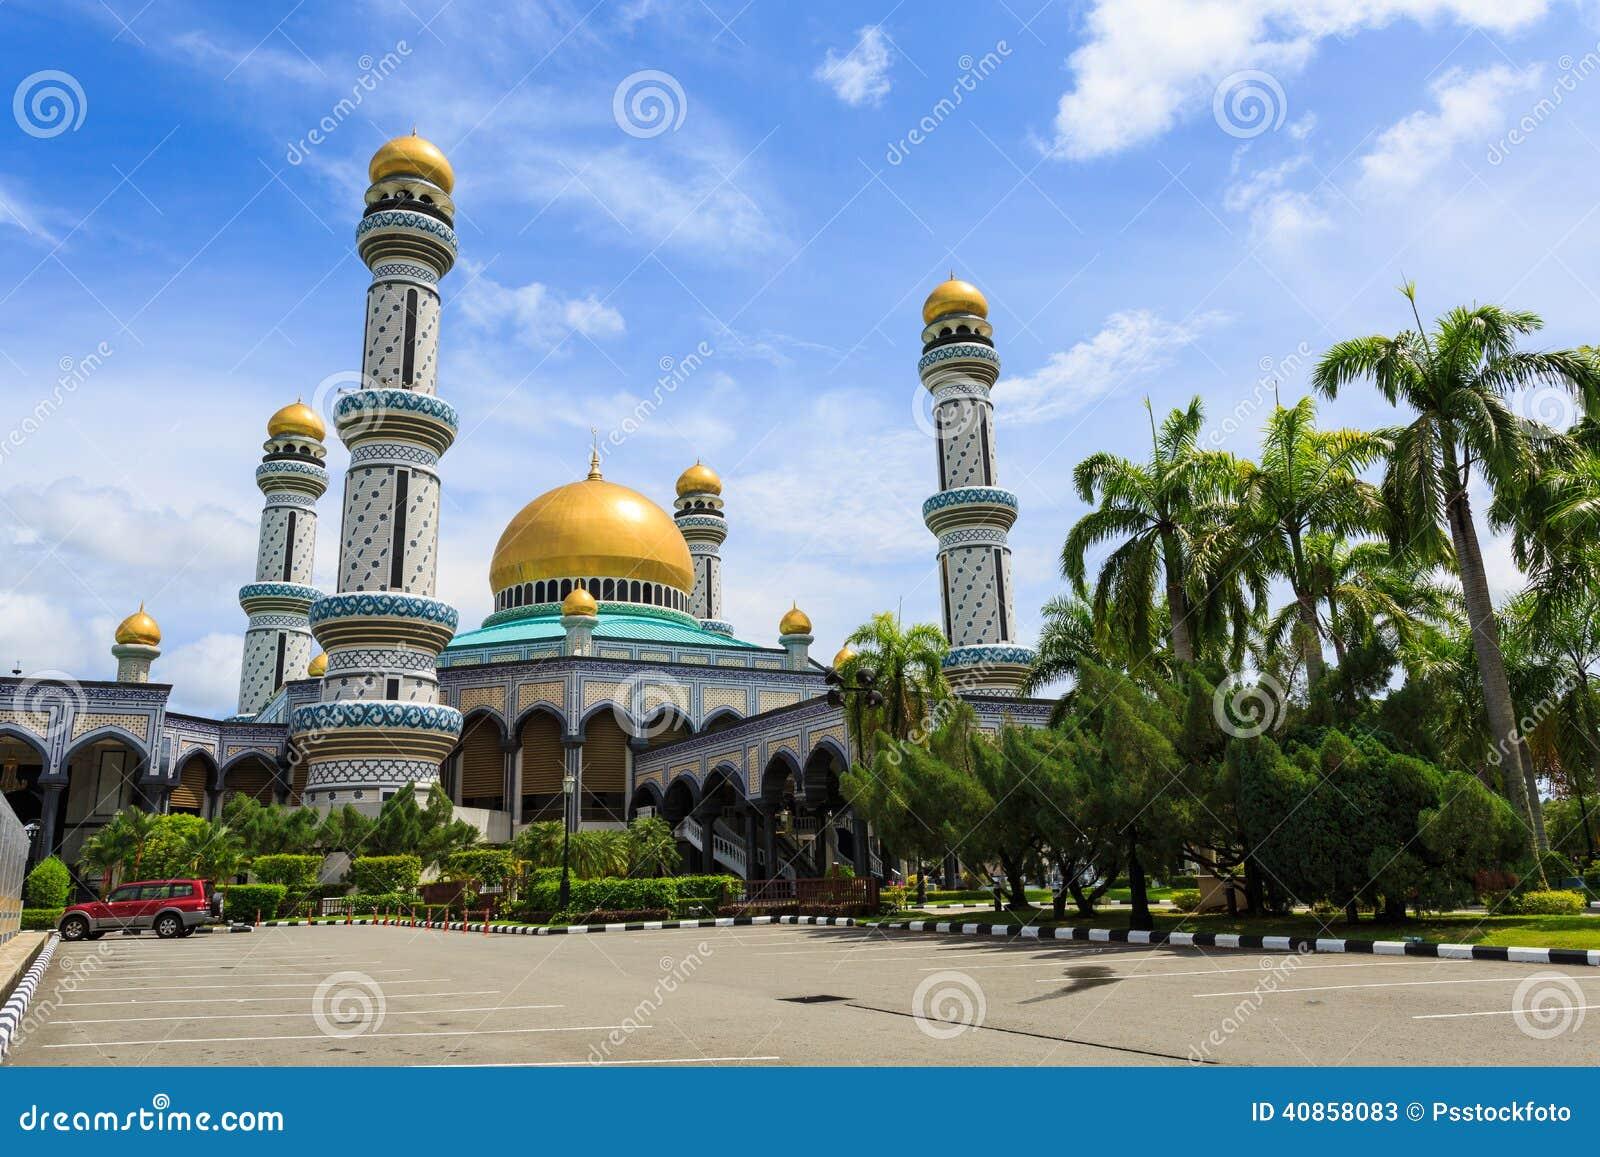 Masjid Brunei Darussalam